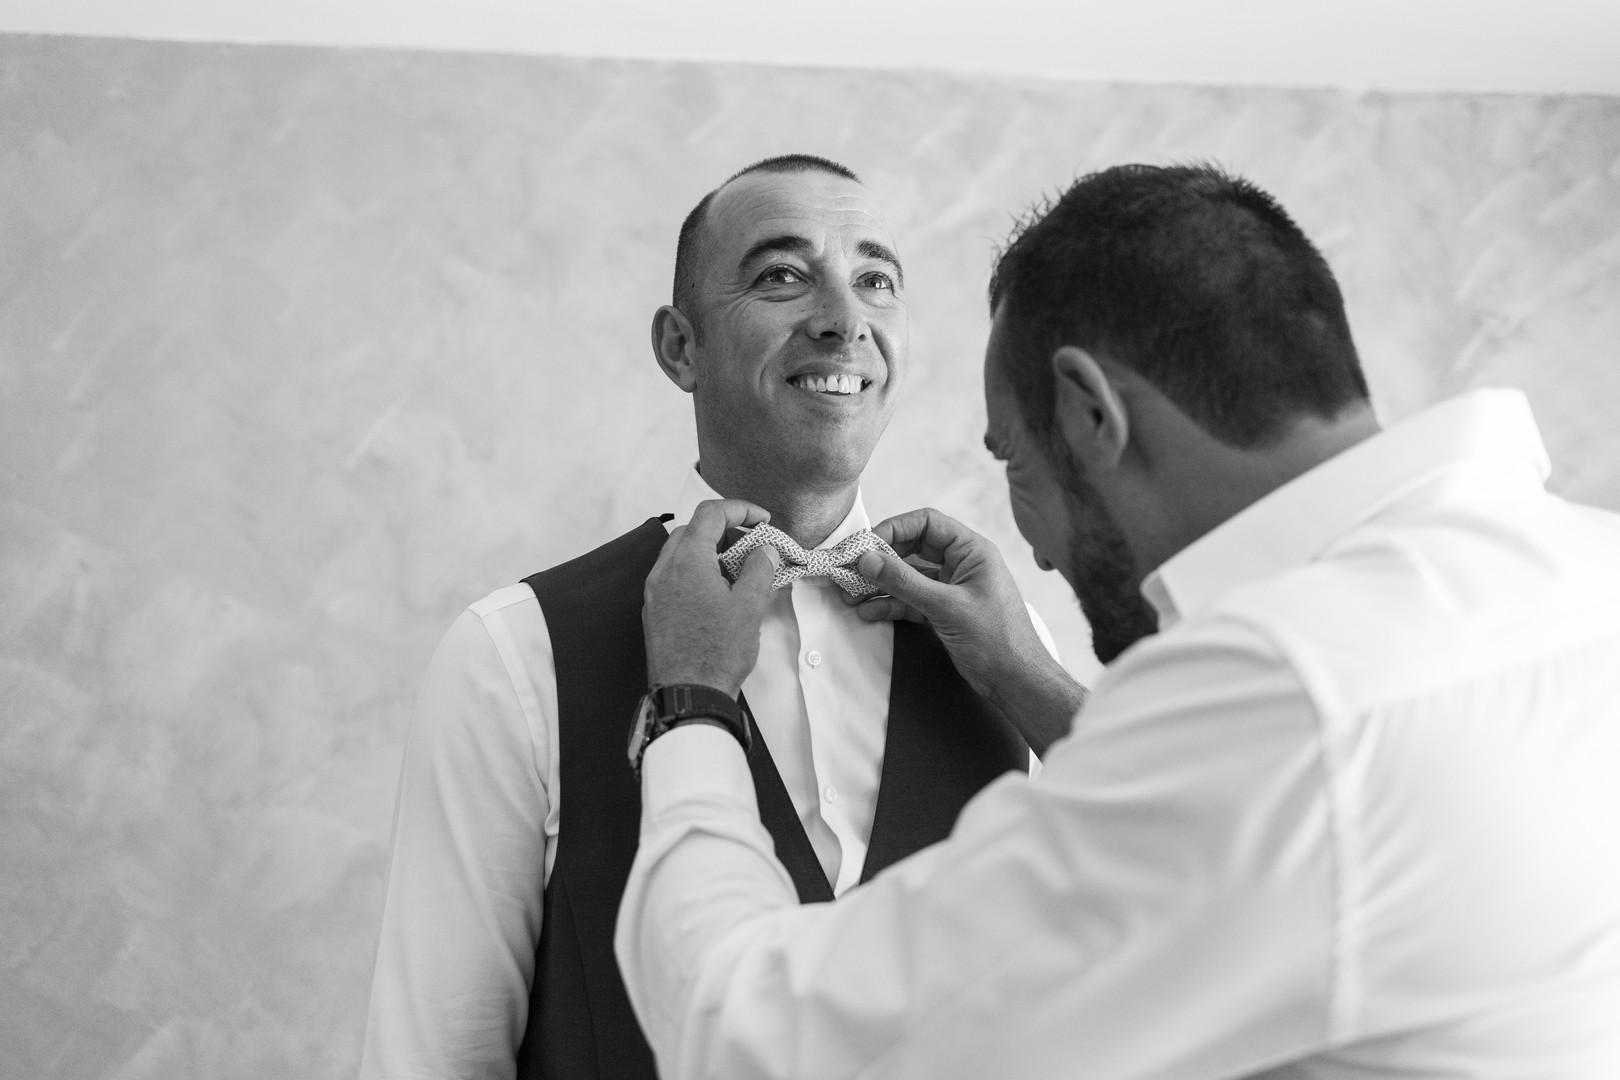 wedding mariage préparatif photography photographie